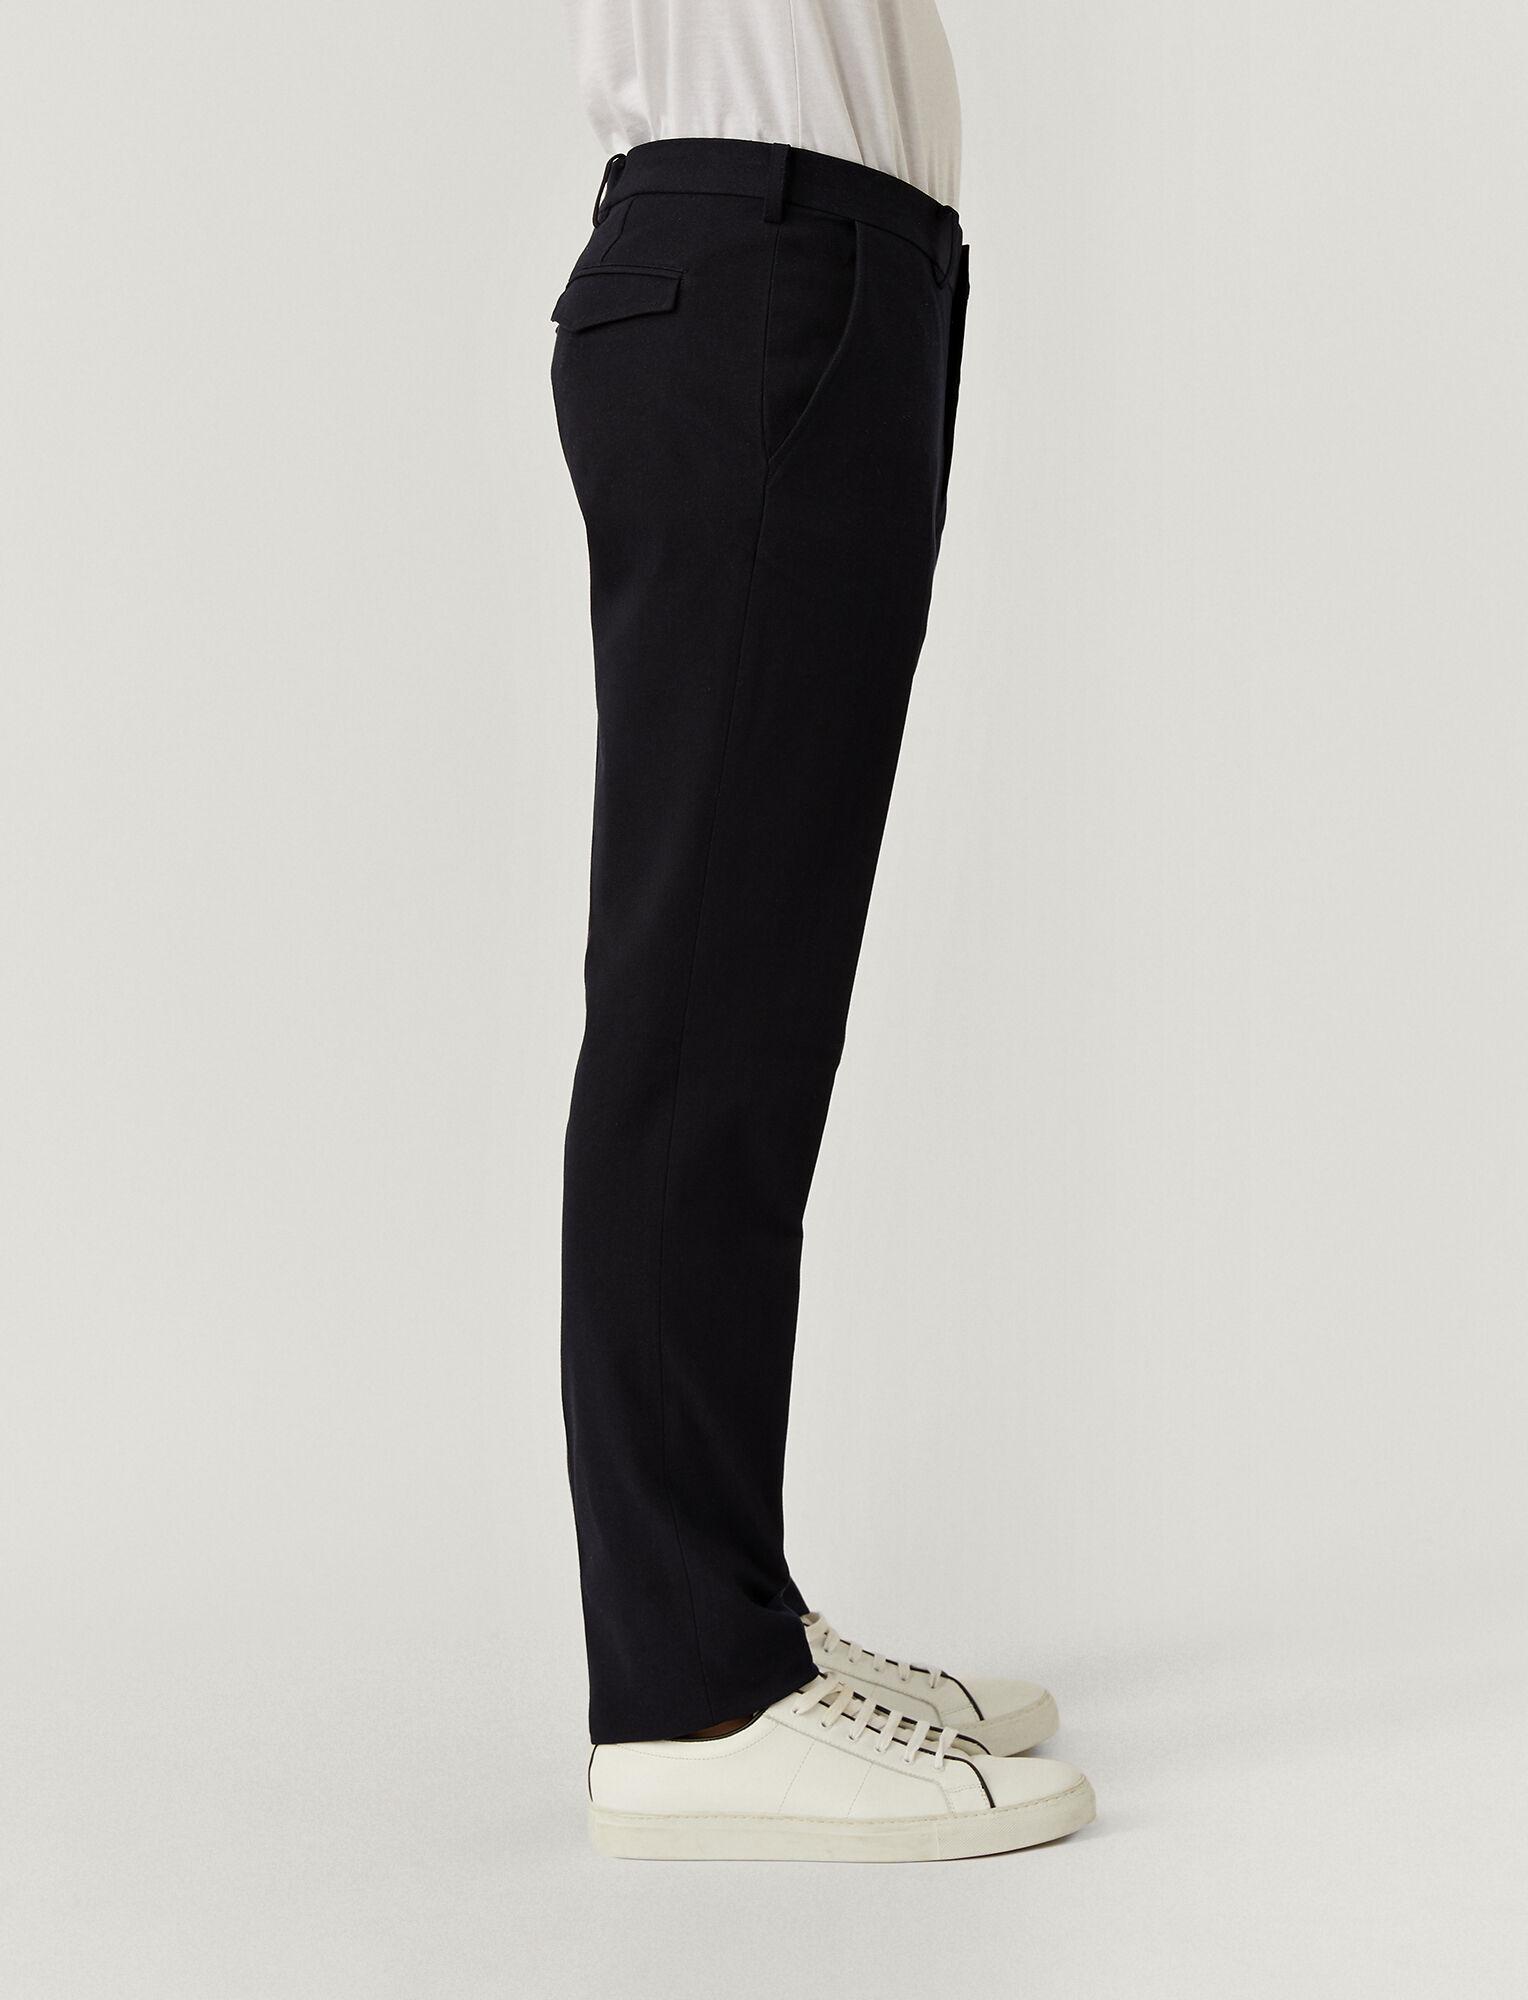 Joseph, Gabardine Stretch City Trousers, in NAVY